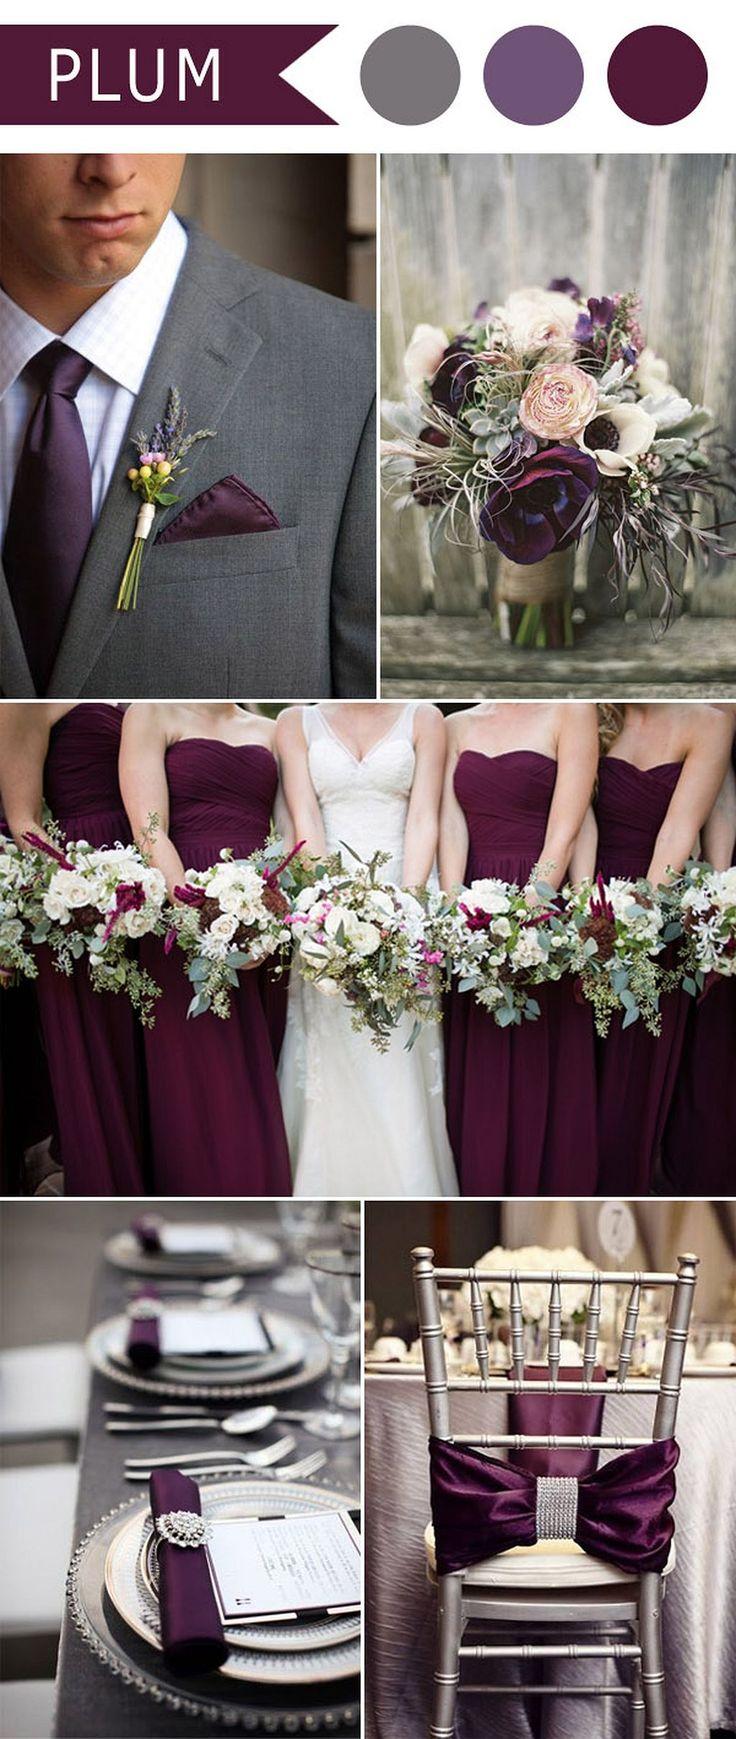 Stunning 68 Plum Purple and Grey Elegant Wedding Color Ideas https://weddmagz.com/68-plum-purple-and-grey-elegant-wedding-color-ideas/